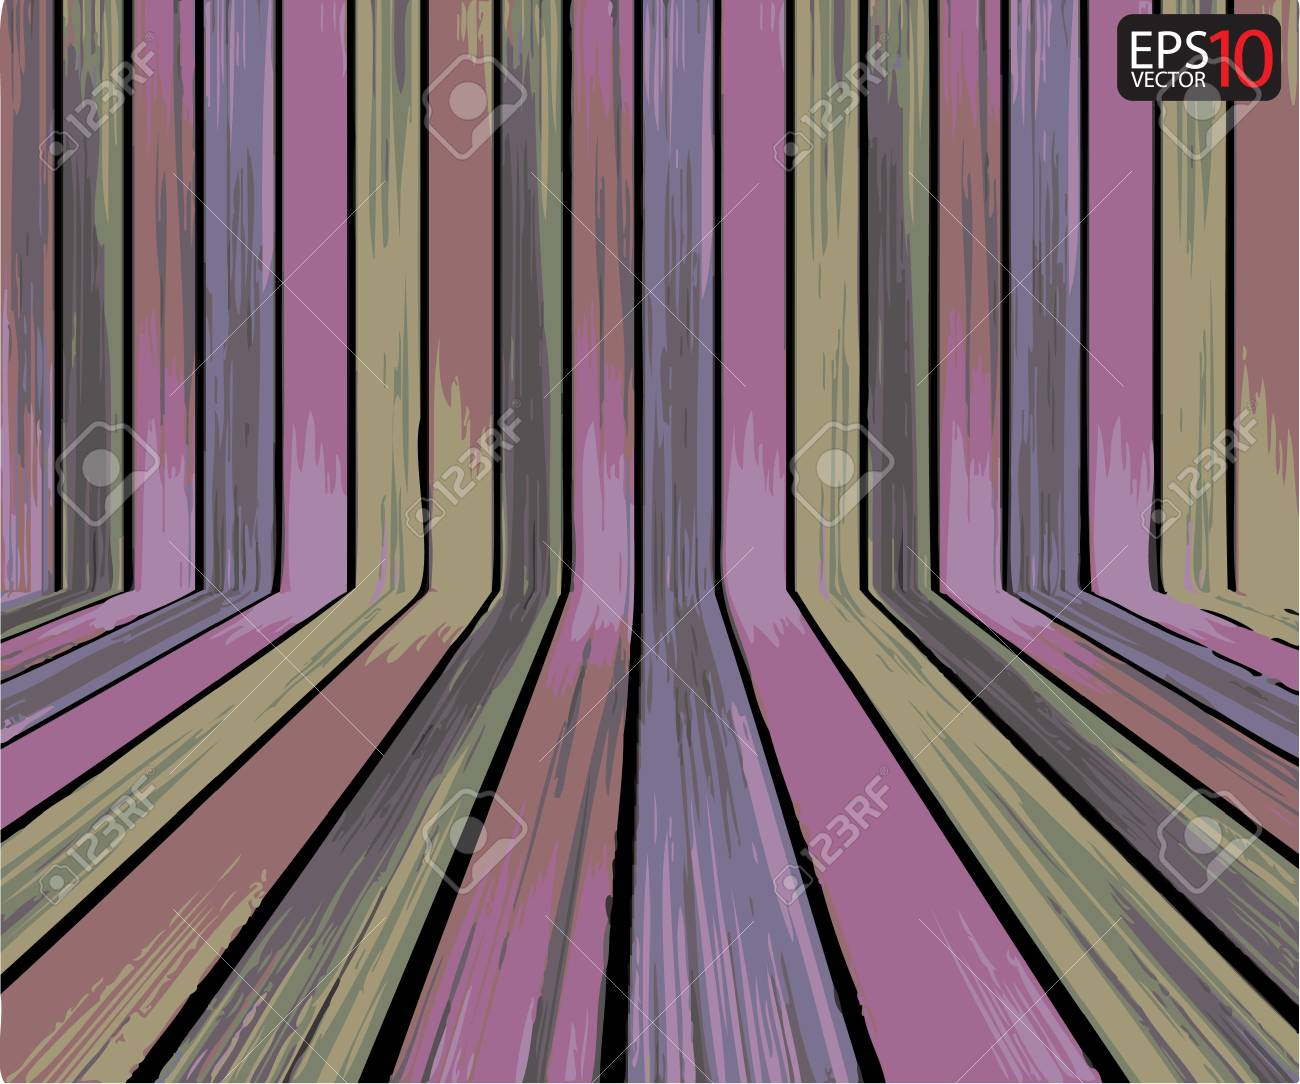 Creative Vector Wood Background Stock Vector - 13077045